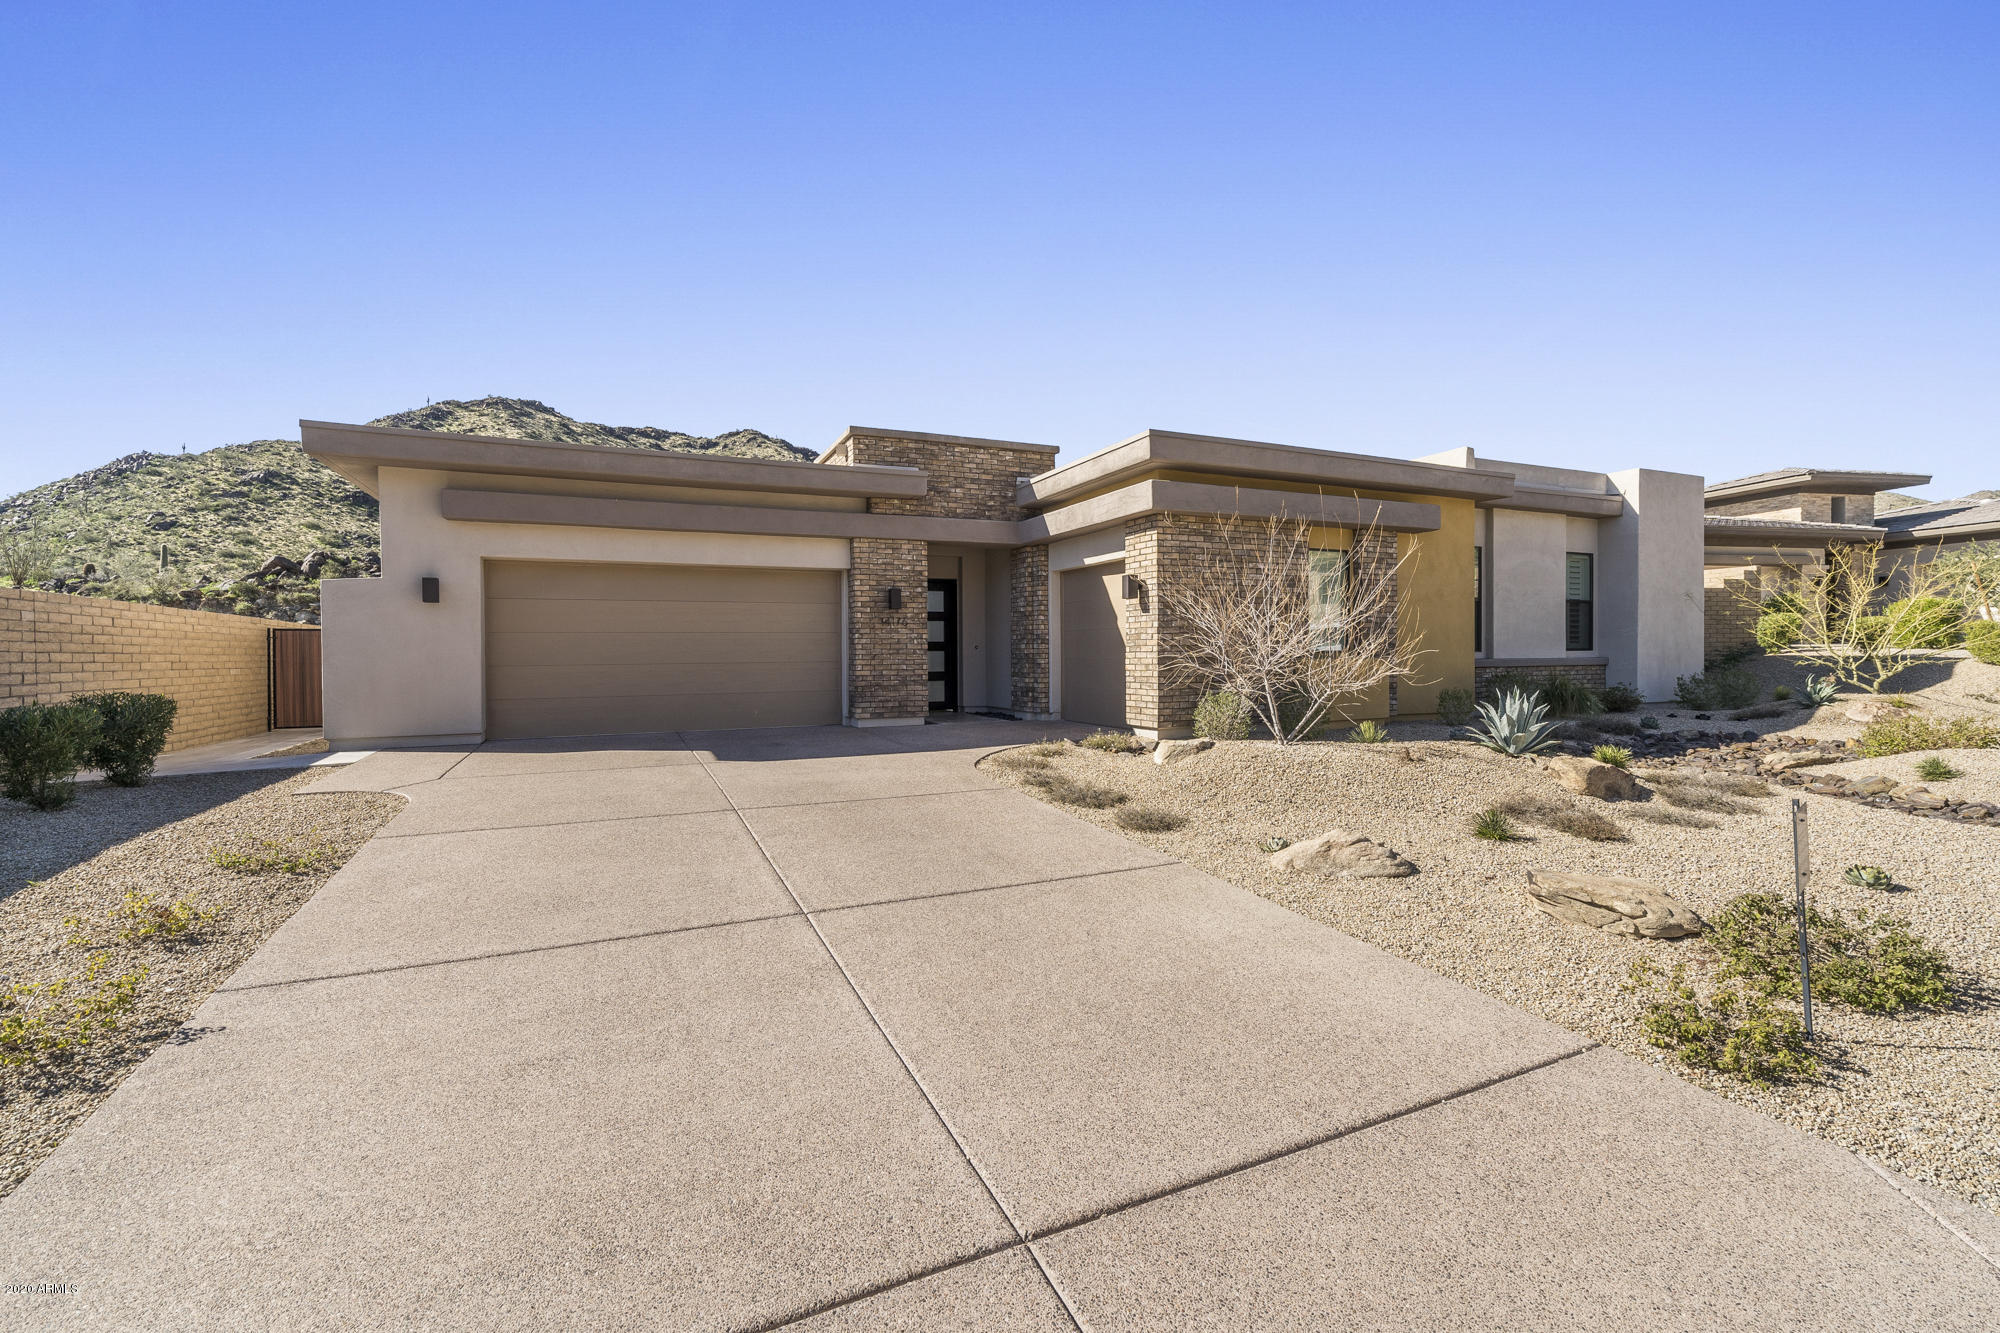 Photo of 14176 N TERRITORY Trail, Fountain Hills, AZ 85268